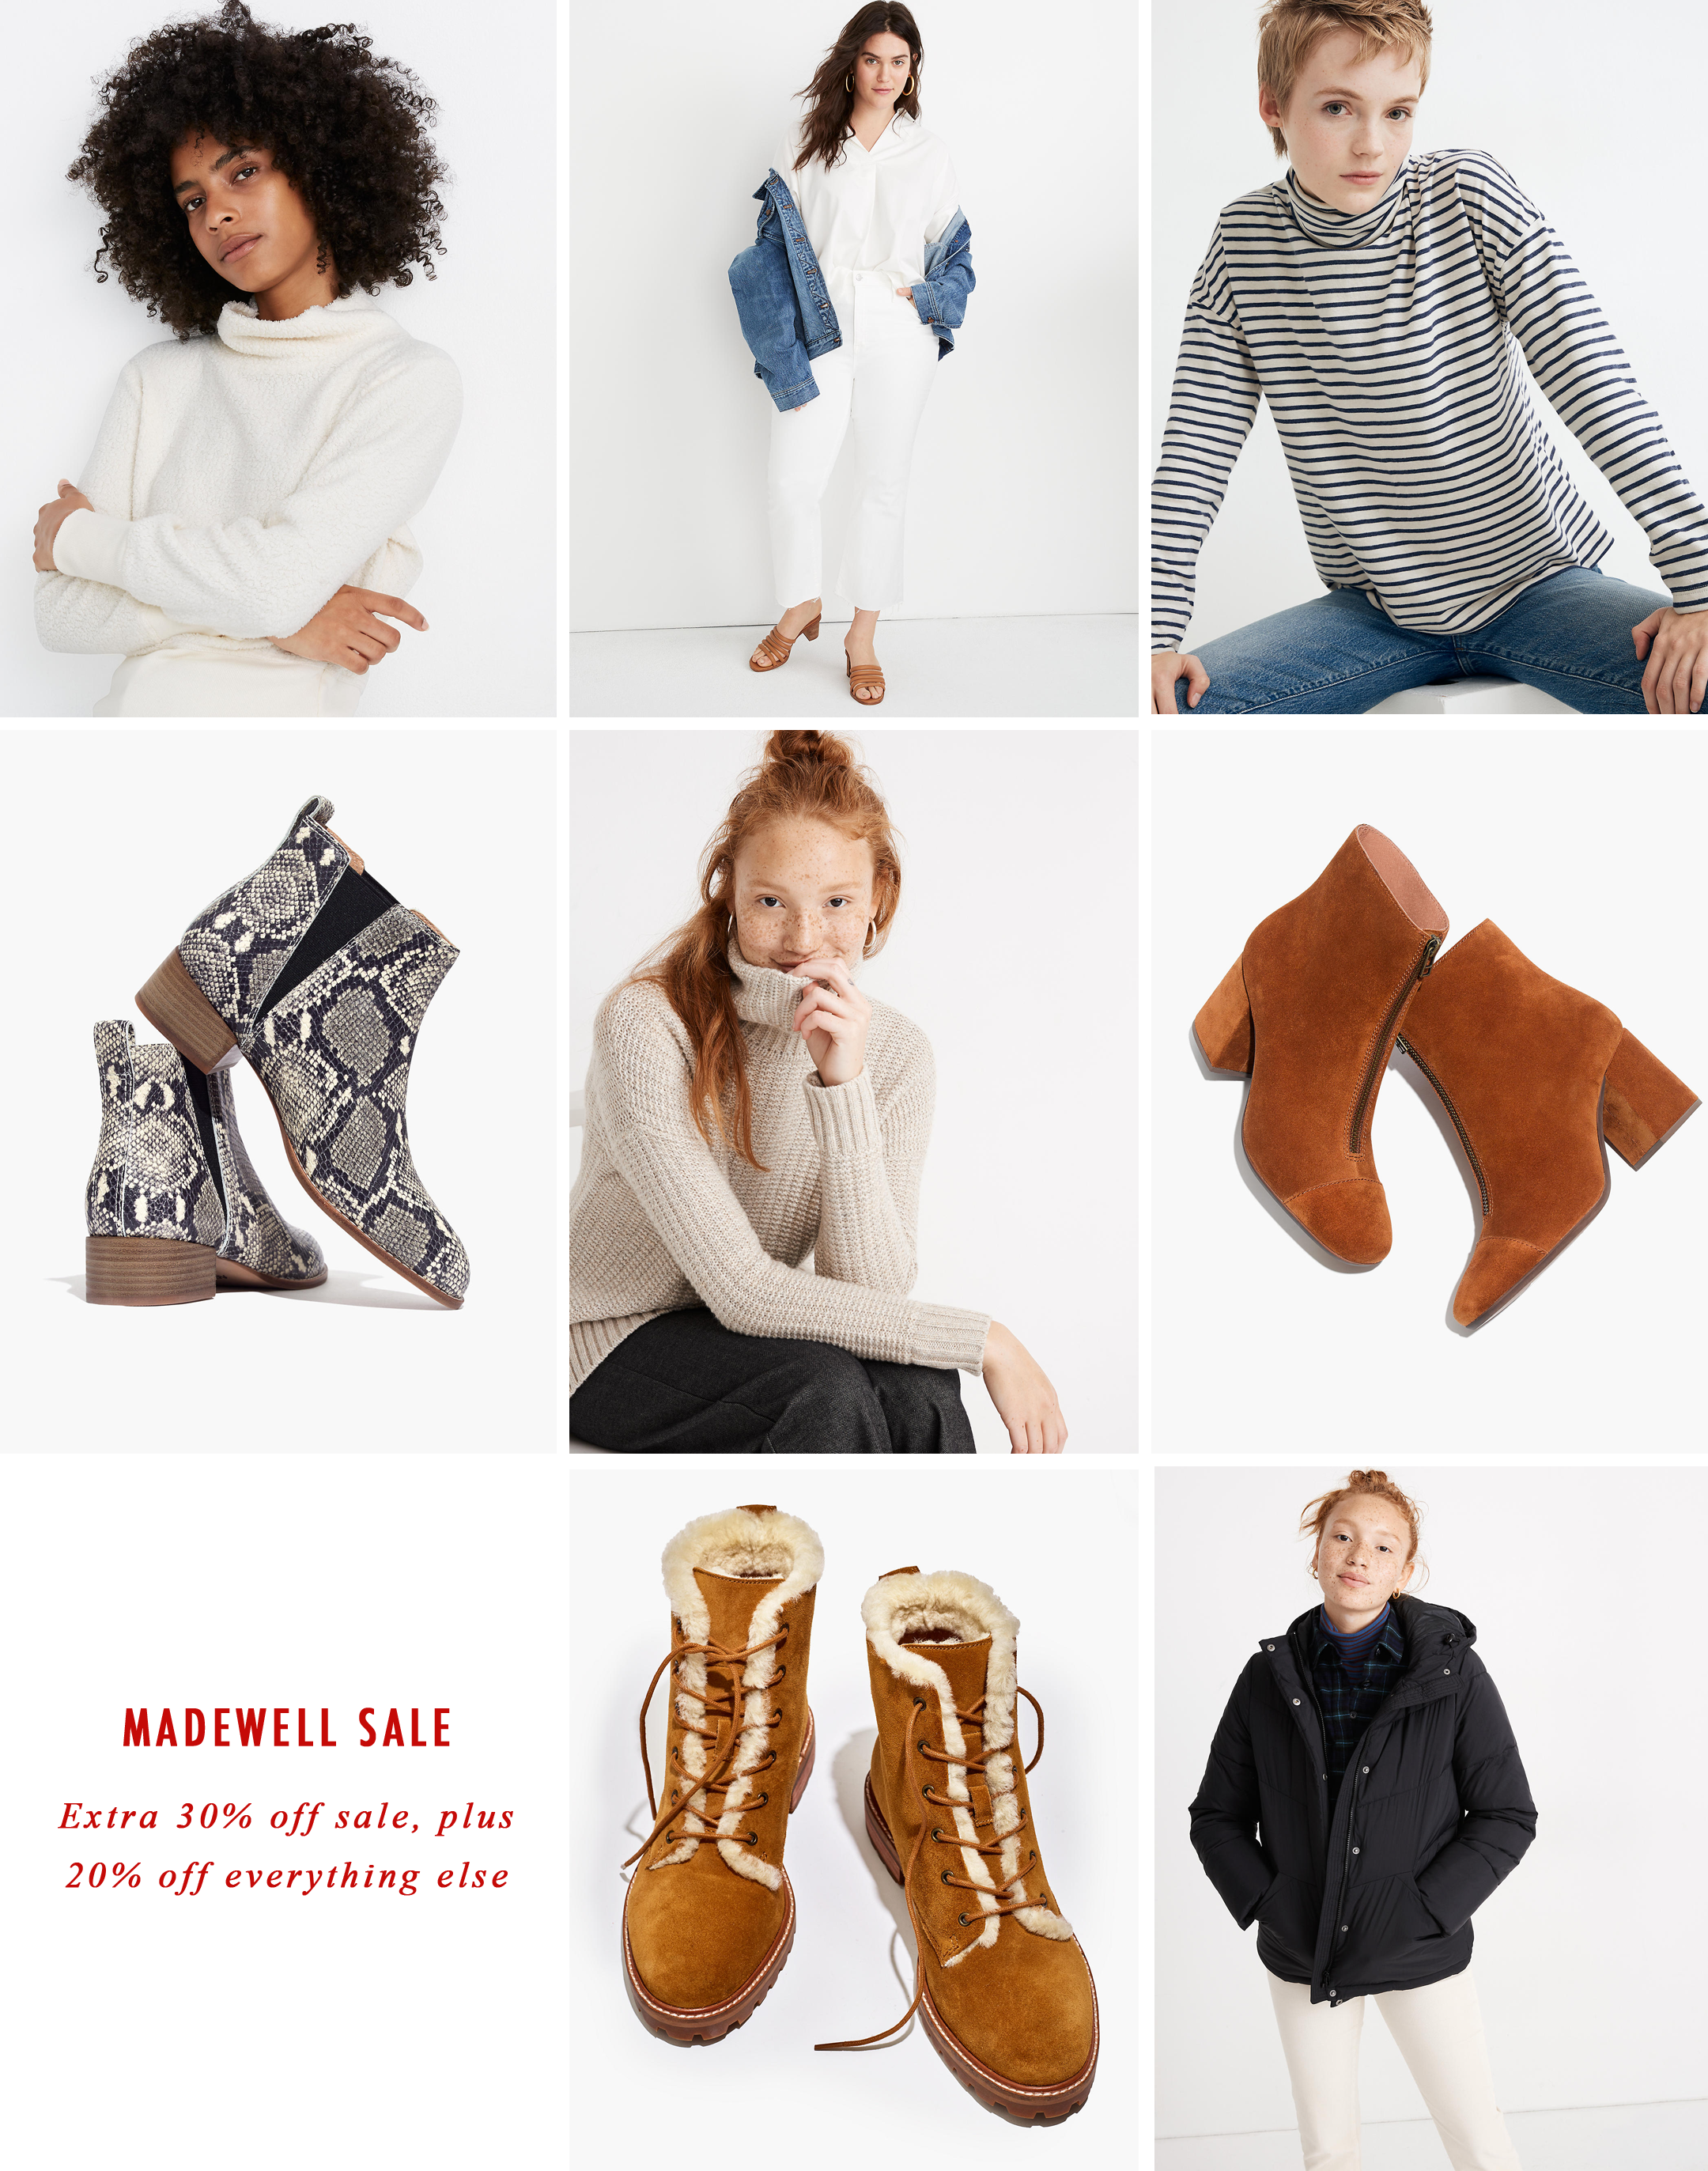 Madewell sale